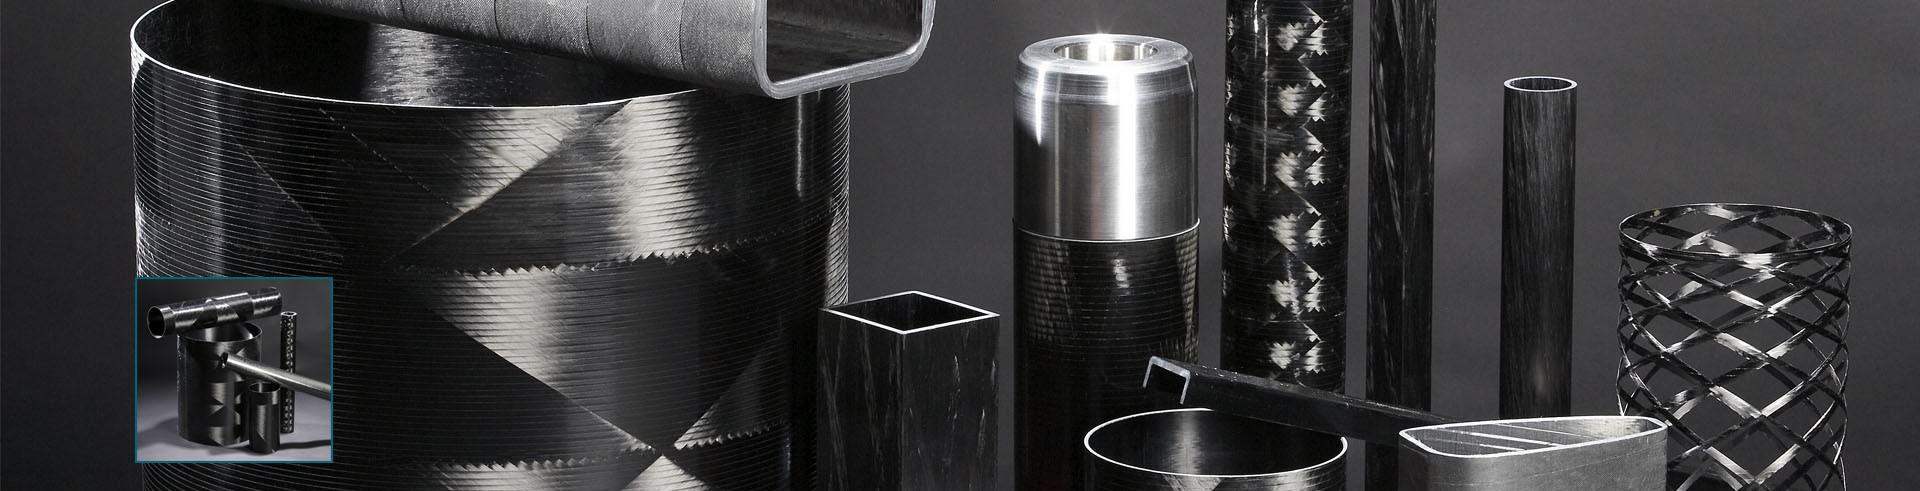 Tubes & Rods - www.tubecarbone.com